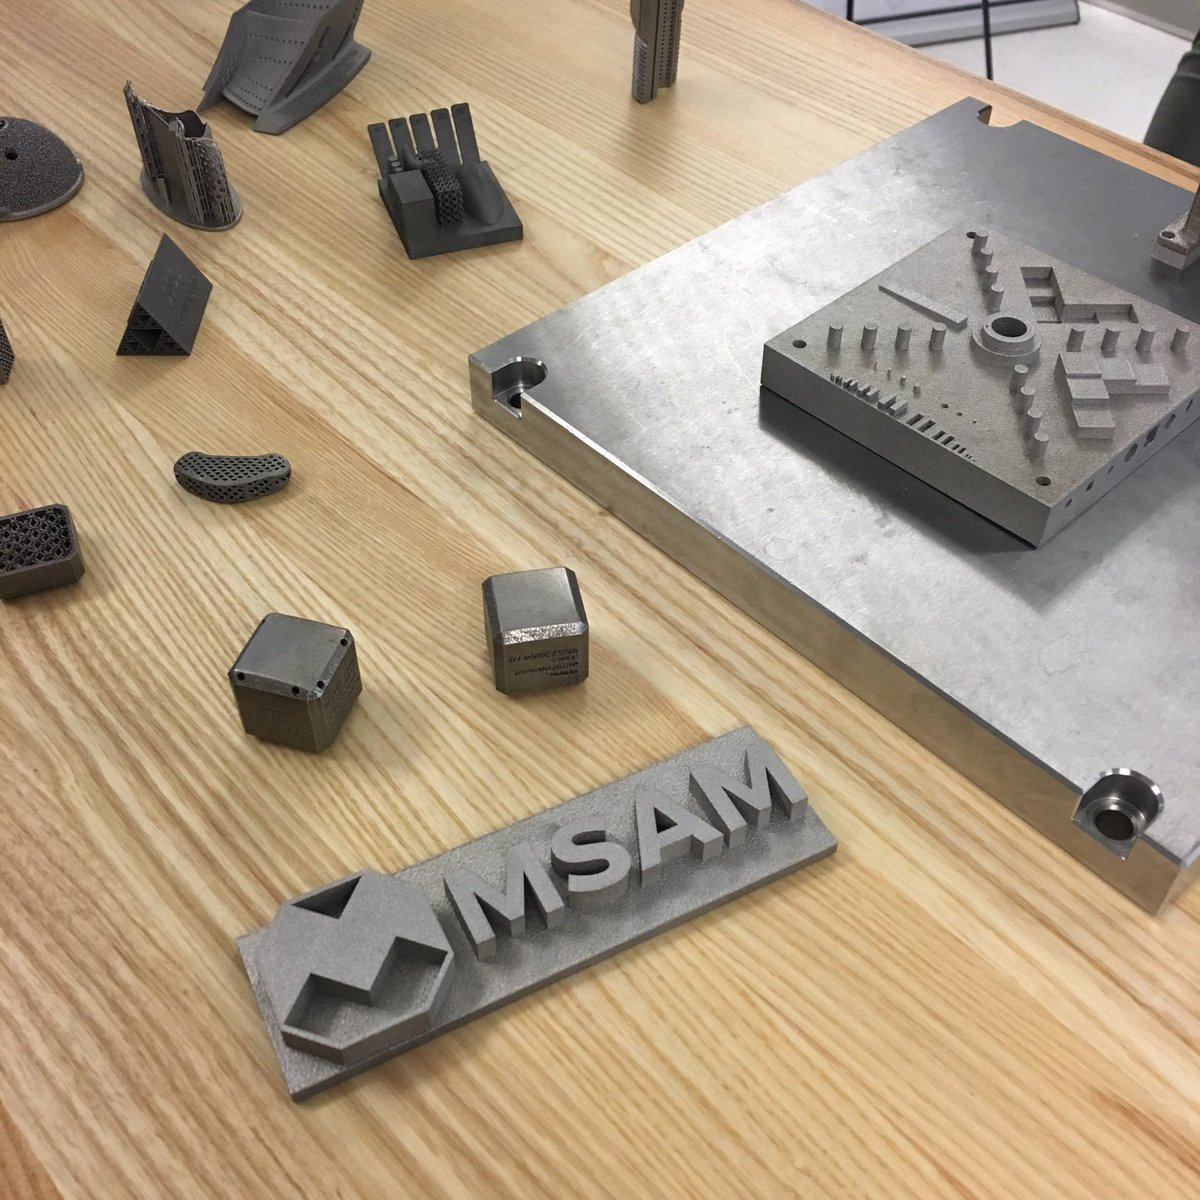 Metal 3D printed parts at the MSAM. Photo via Reza Moridi.